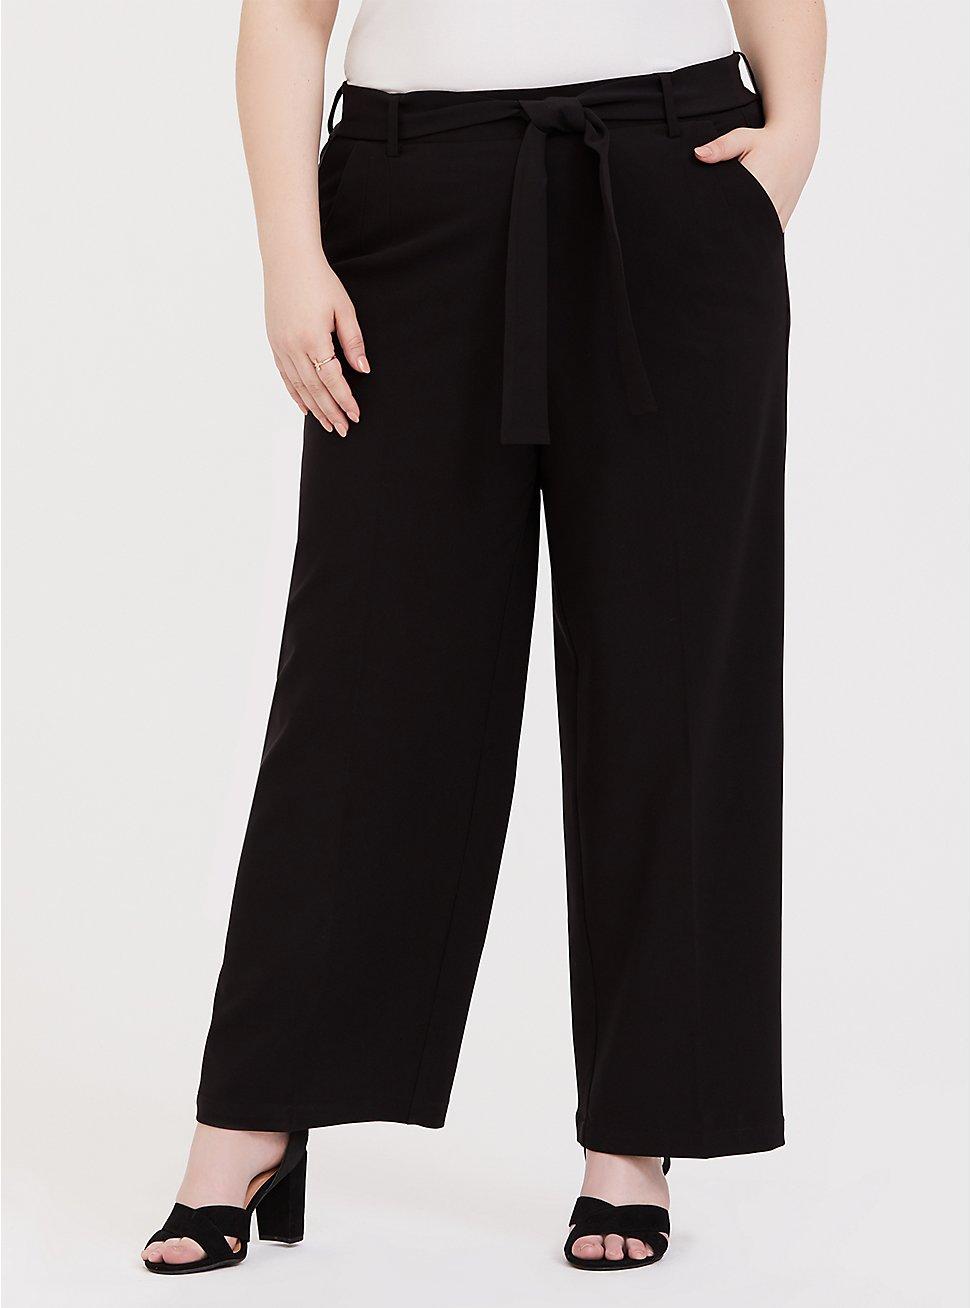 Wide Leg Tie Front Shark Skin Pant - Black 4